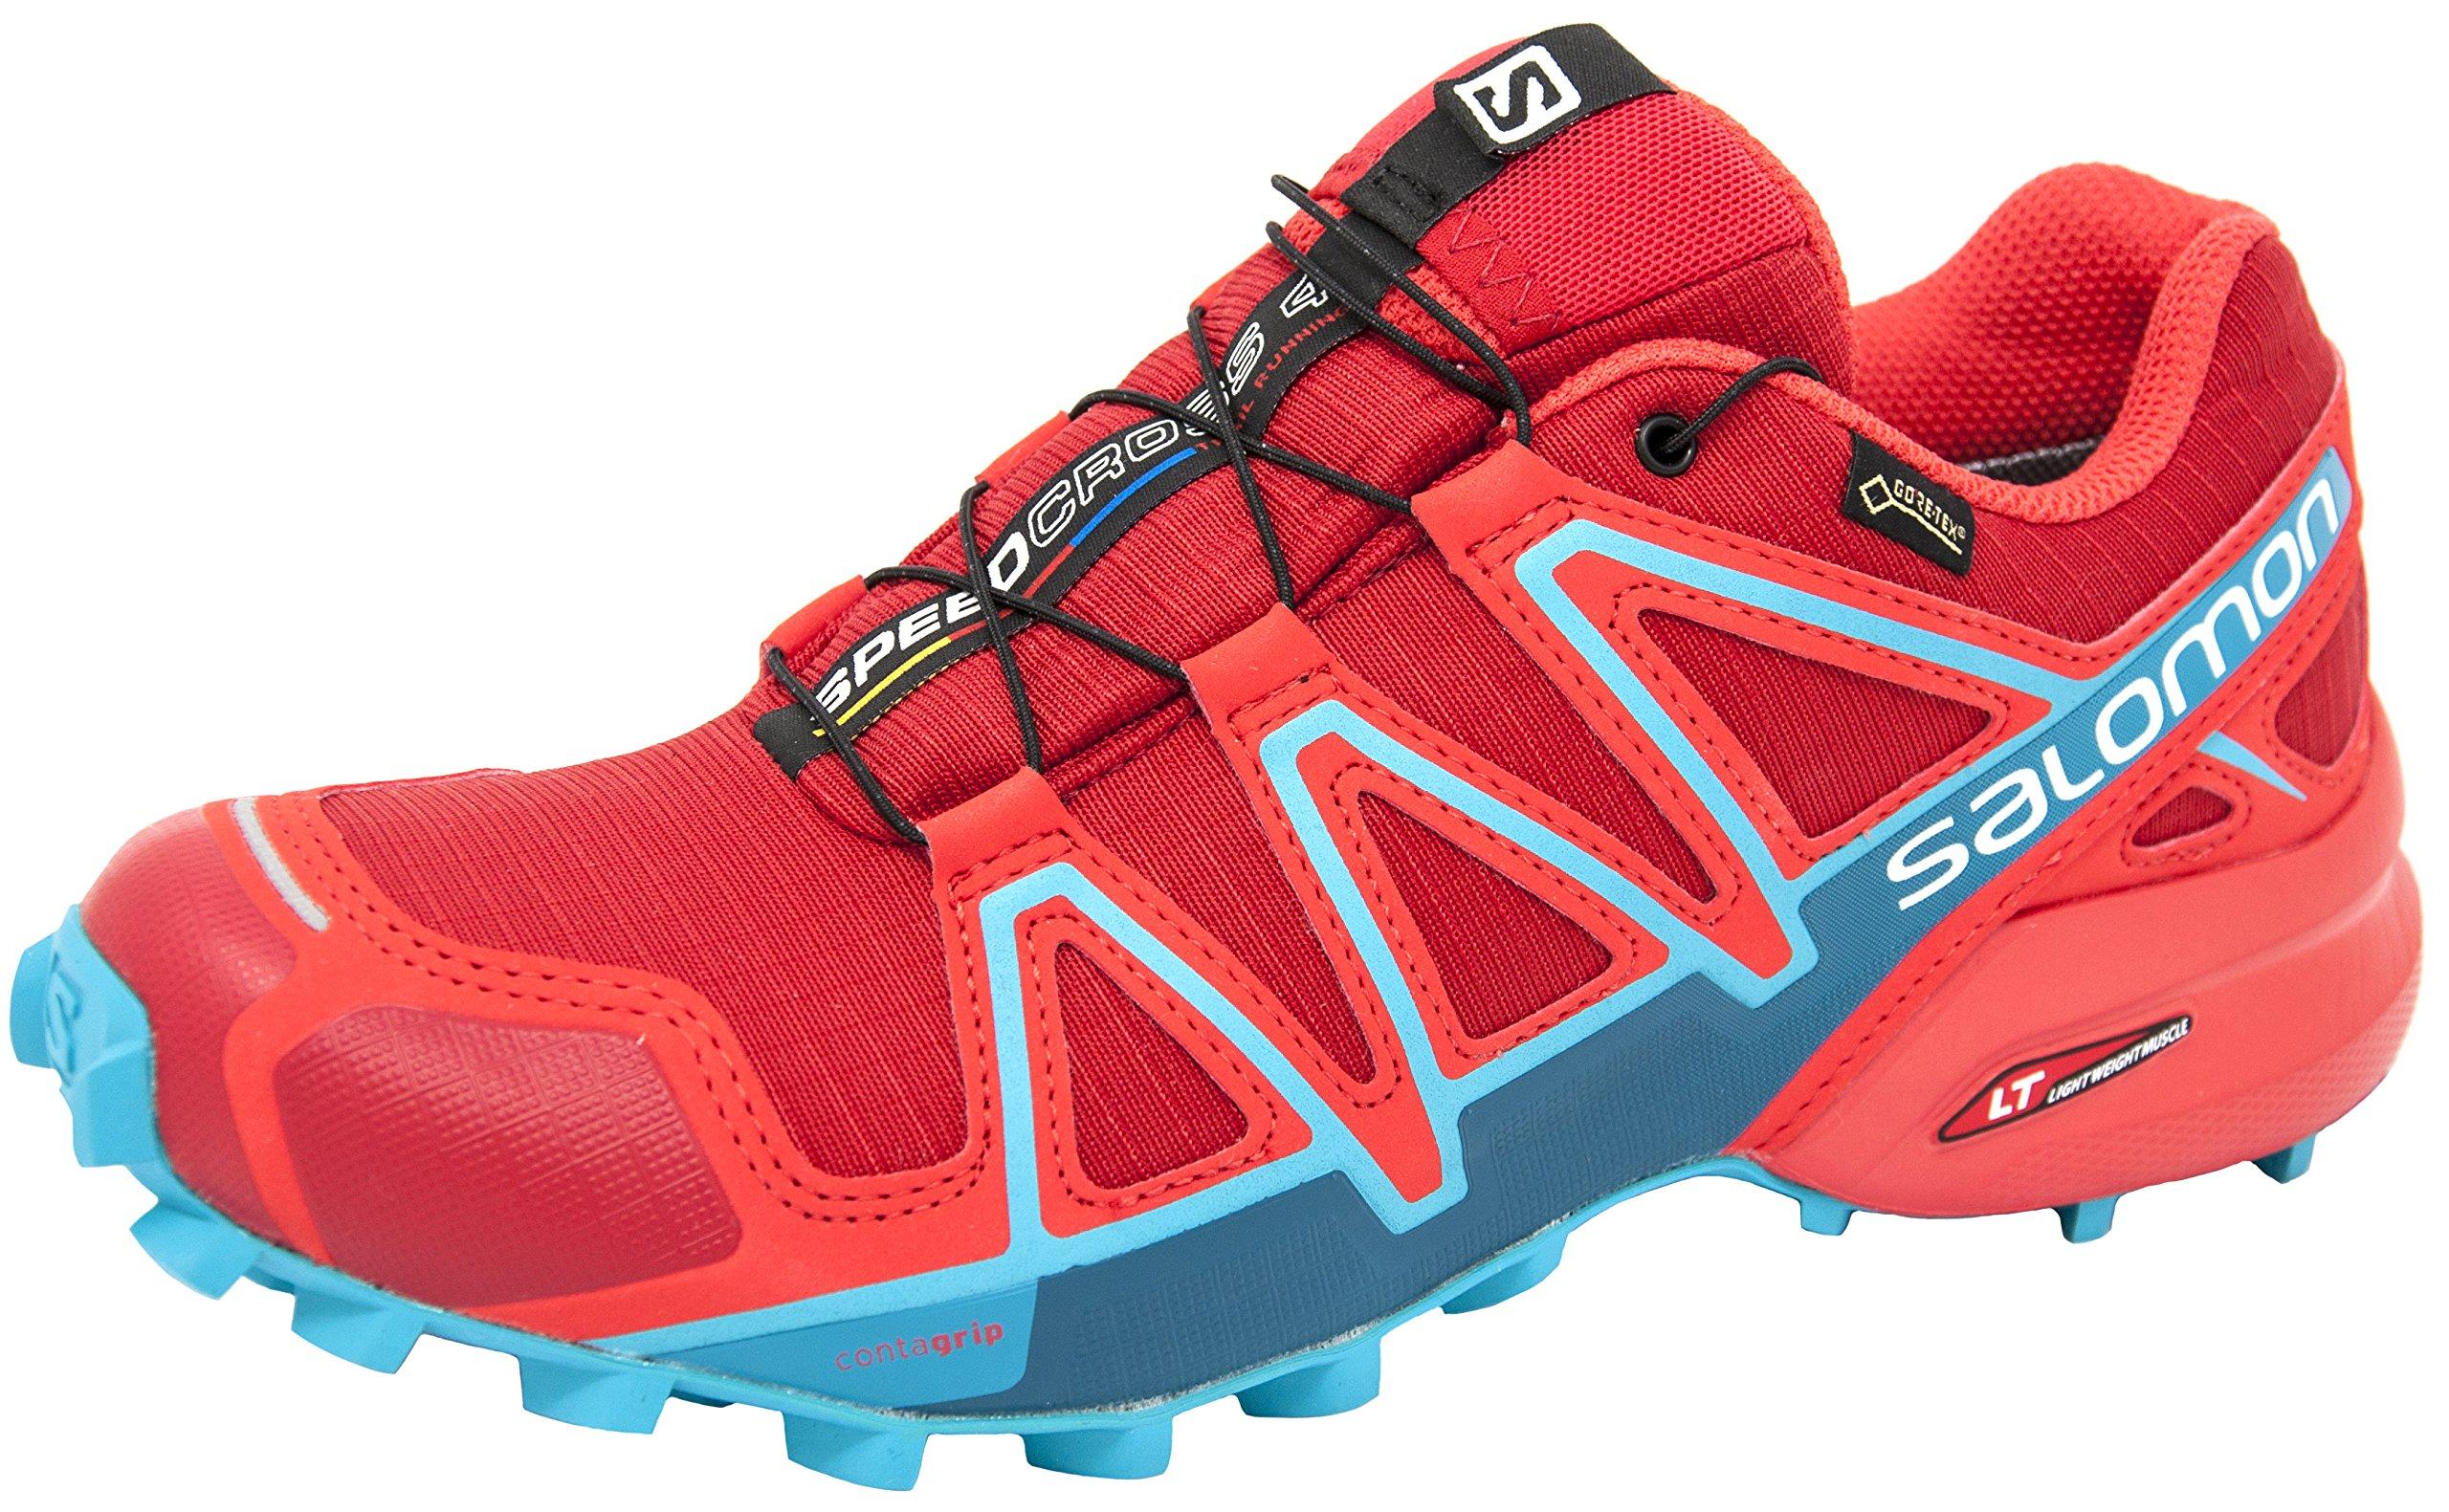 Salomon Women's Speedcross 4 GTX W Trail Running Shoe, Barbados Cherry, 8 M US